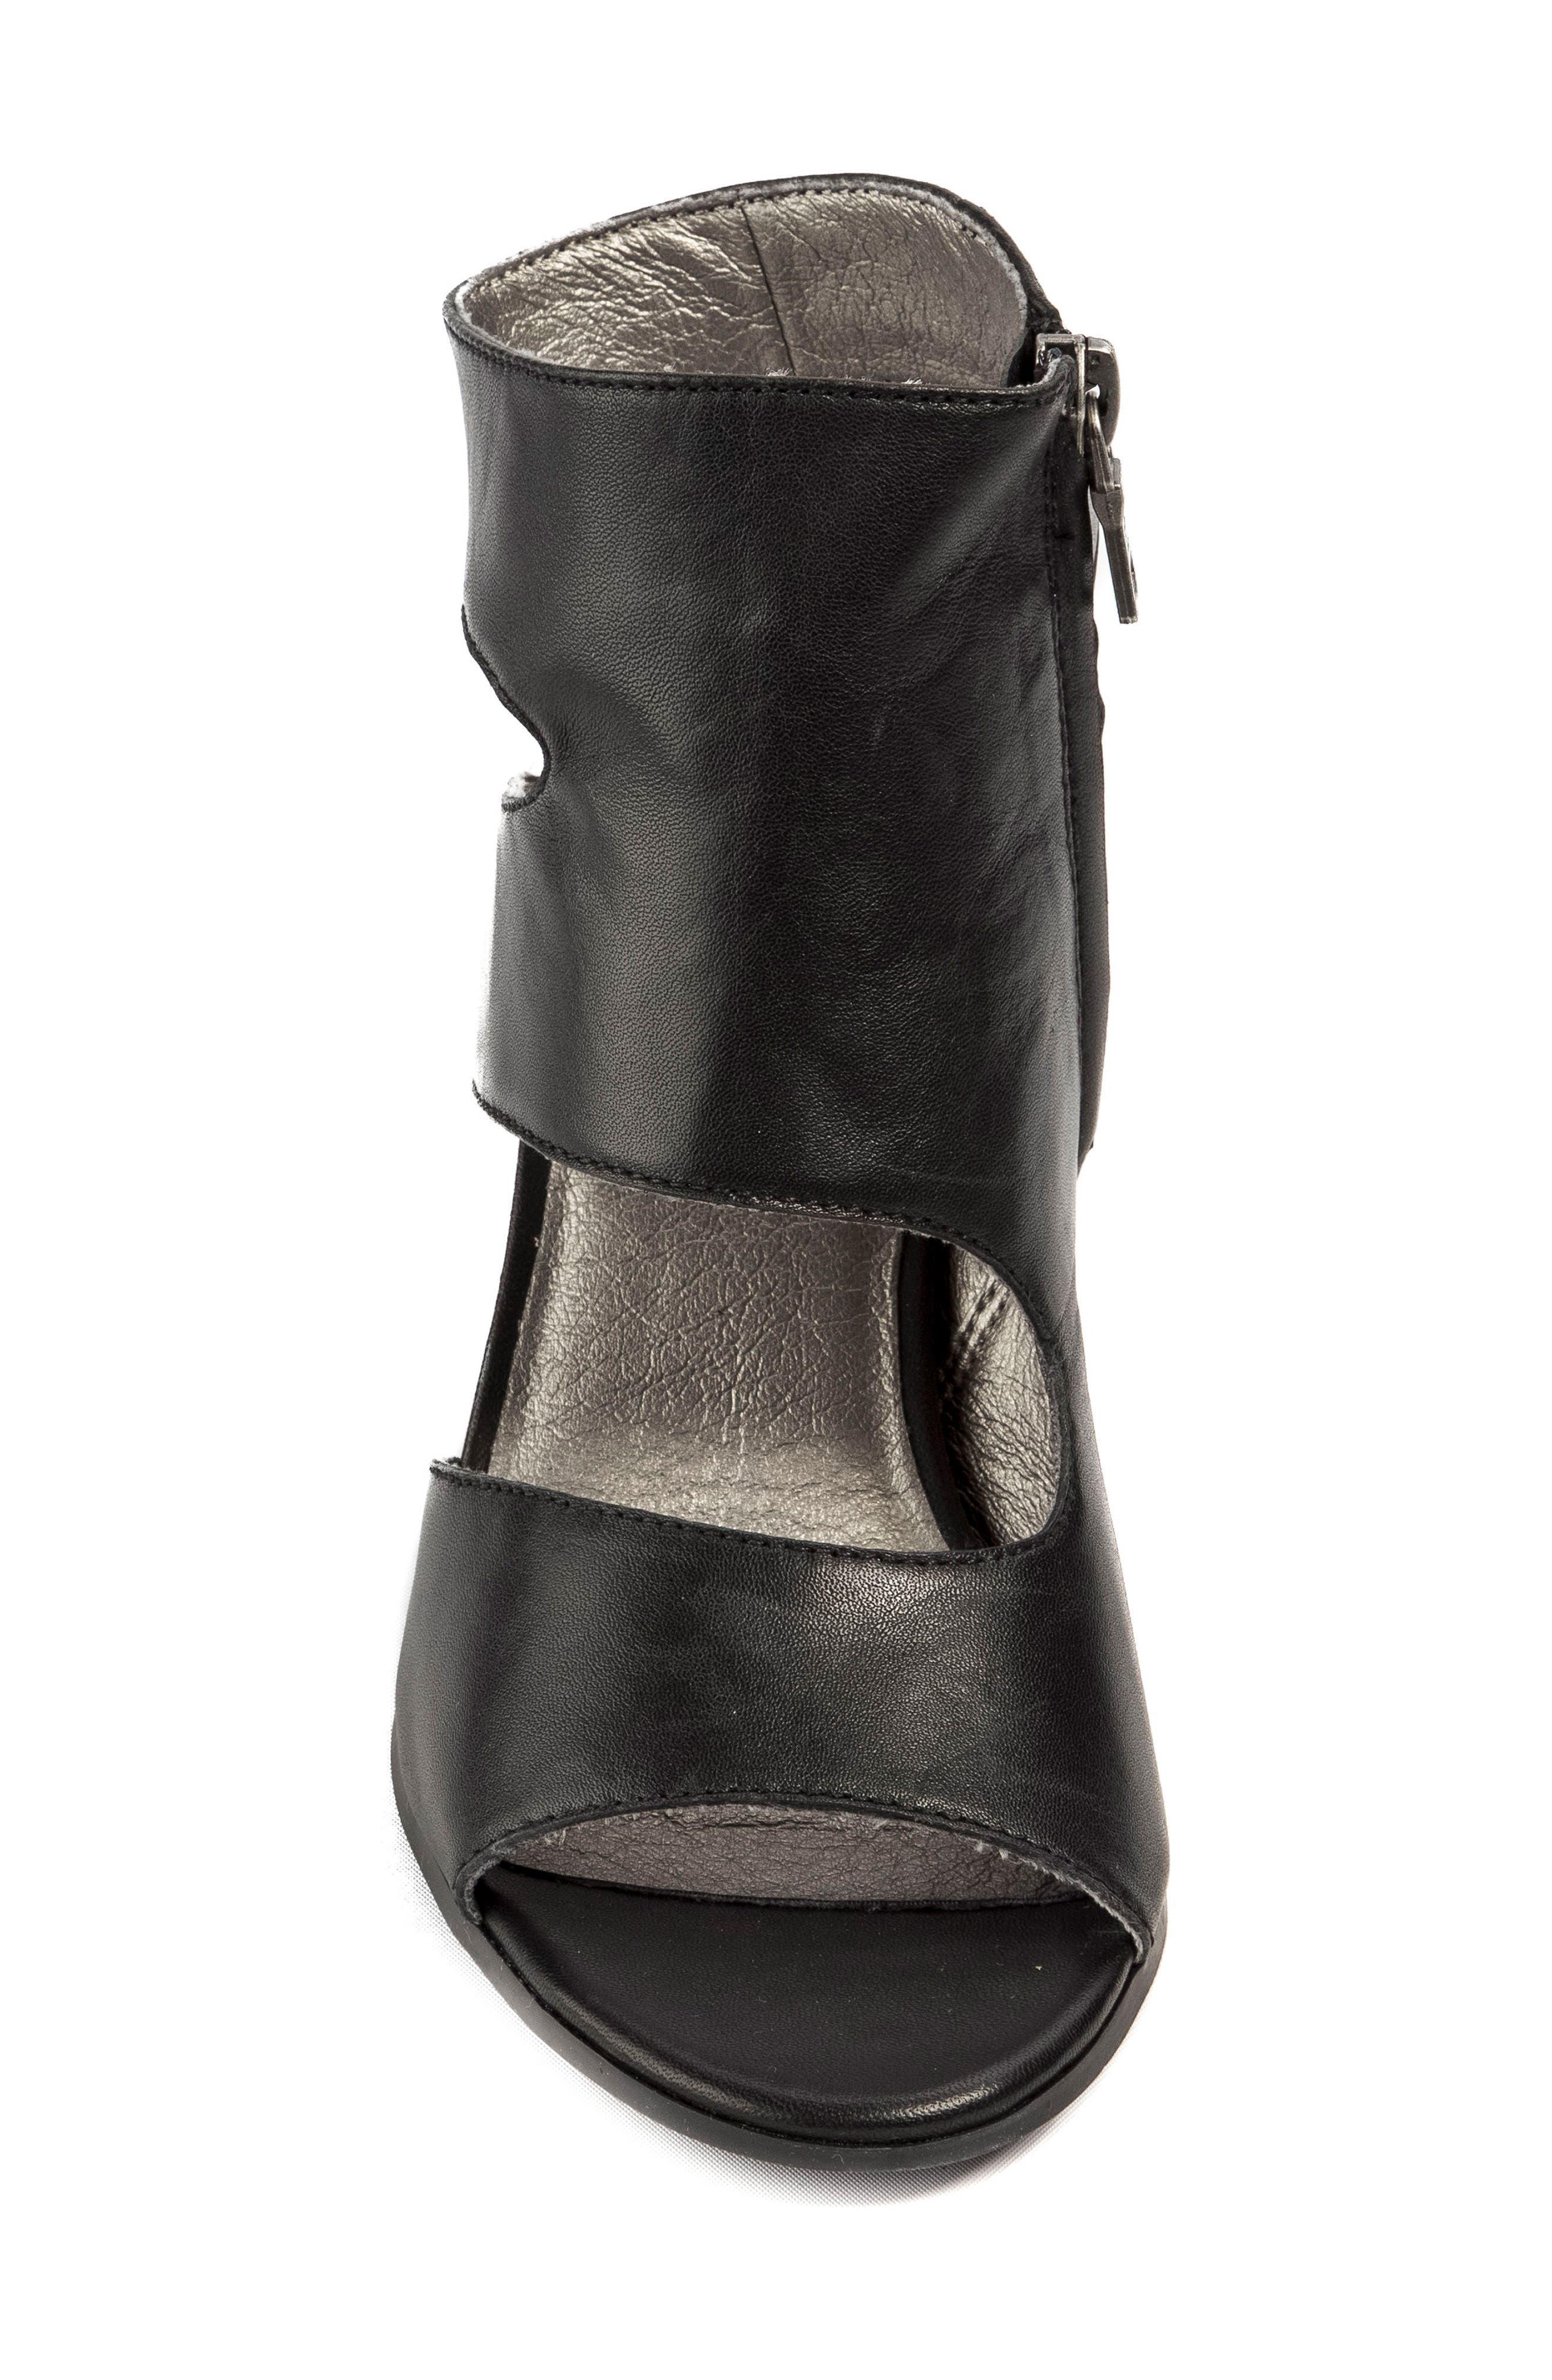 Hadie Asymmetrical Tall Sandal,                             Alternate thumbnail 5, color,                             Black Leather